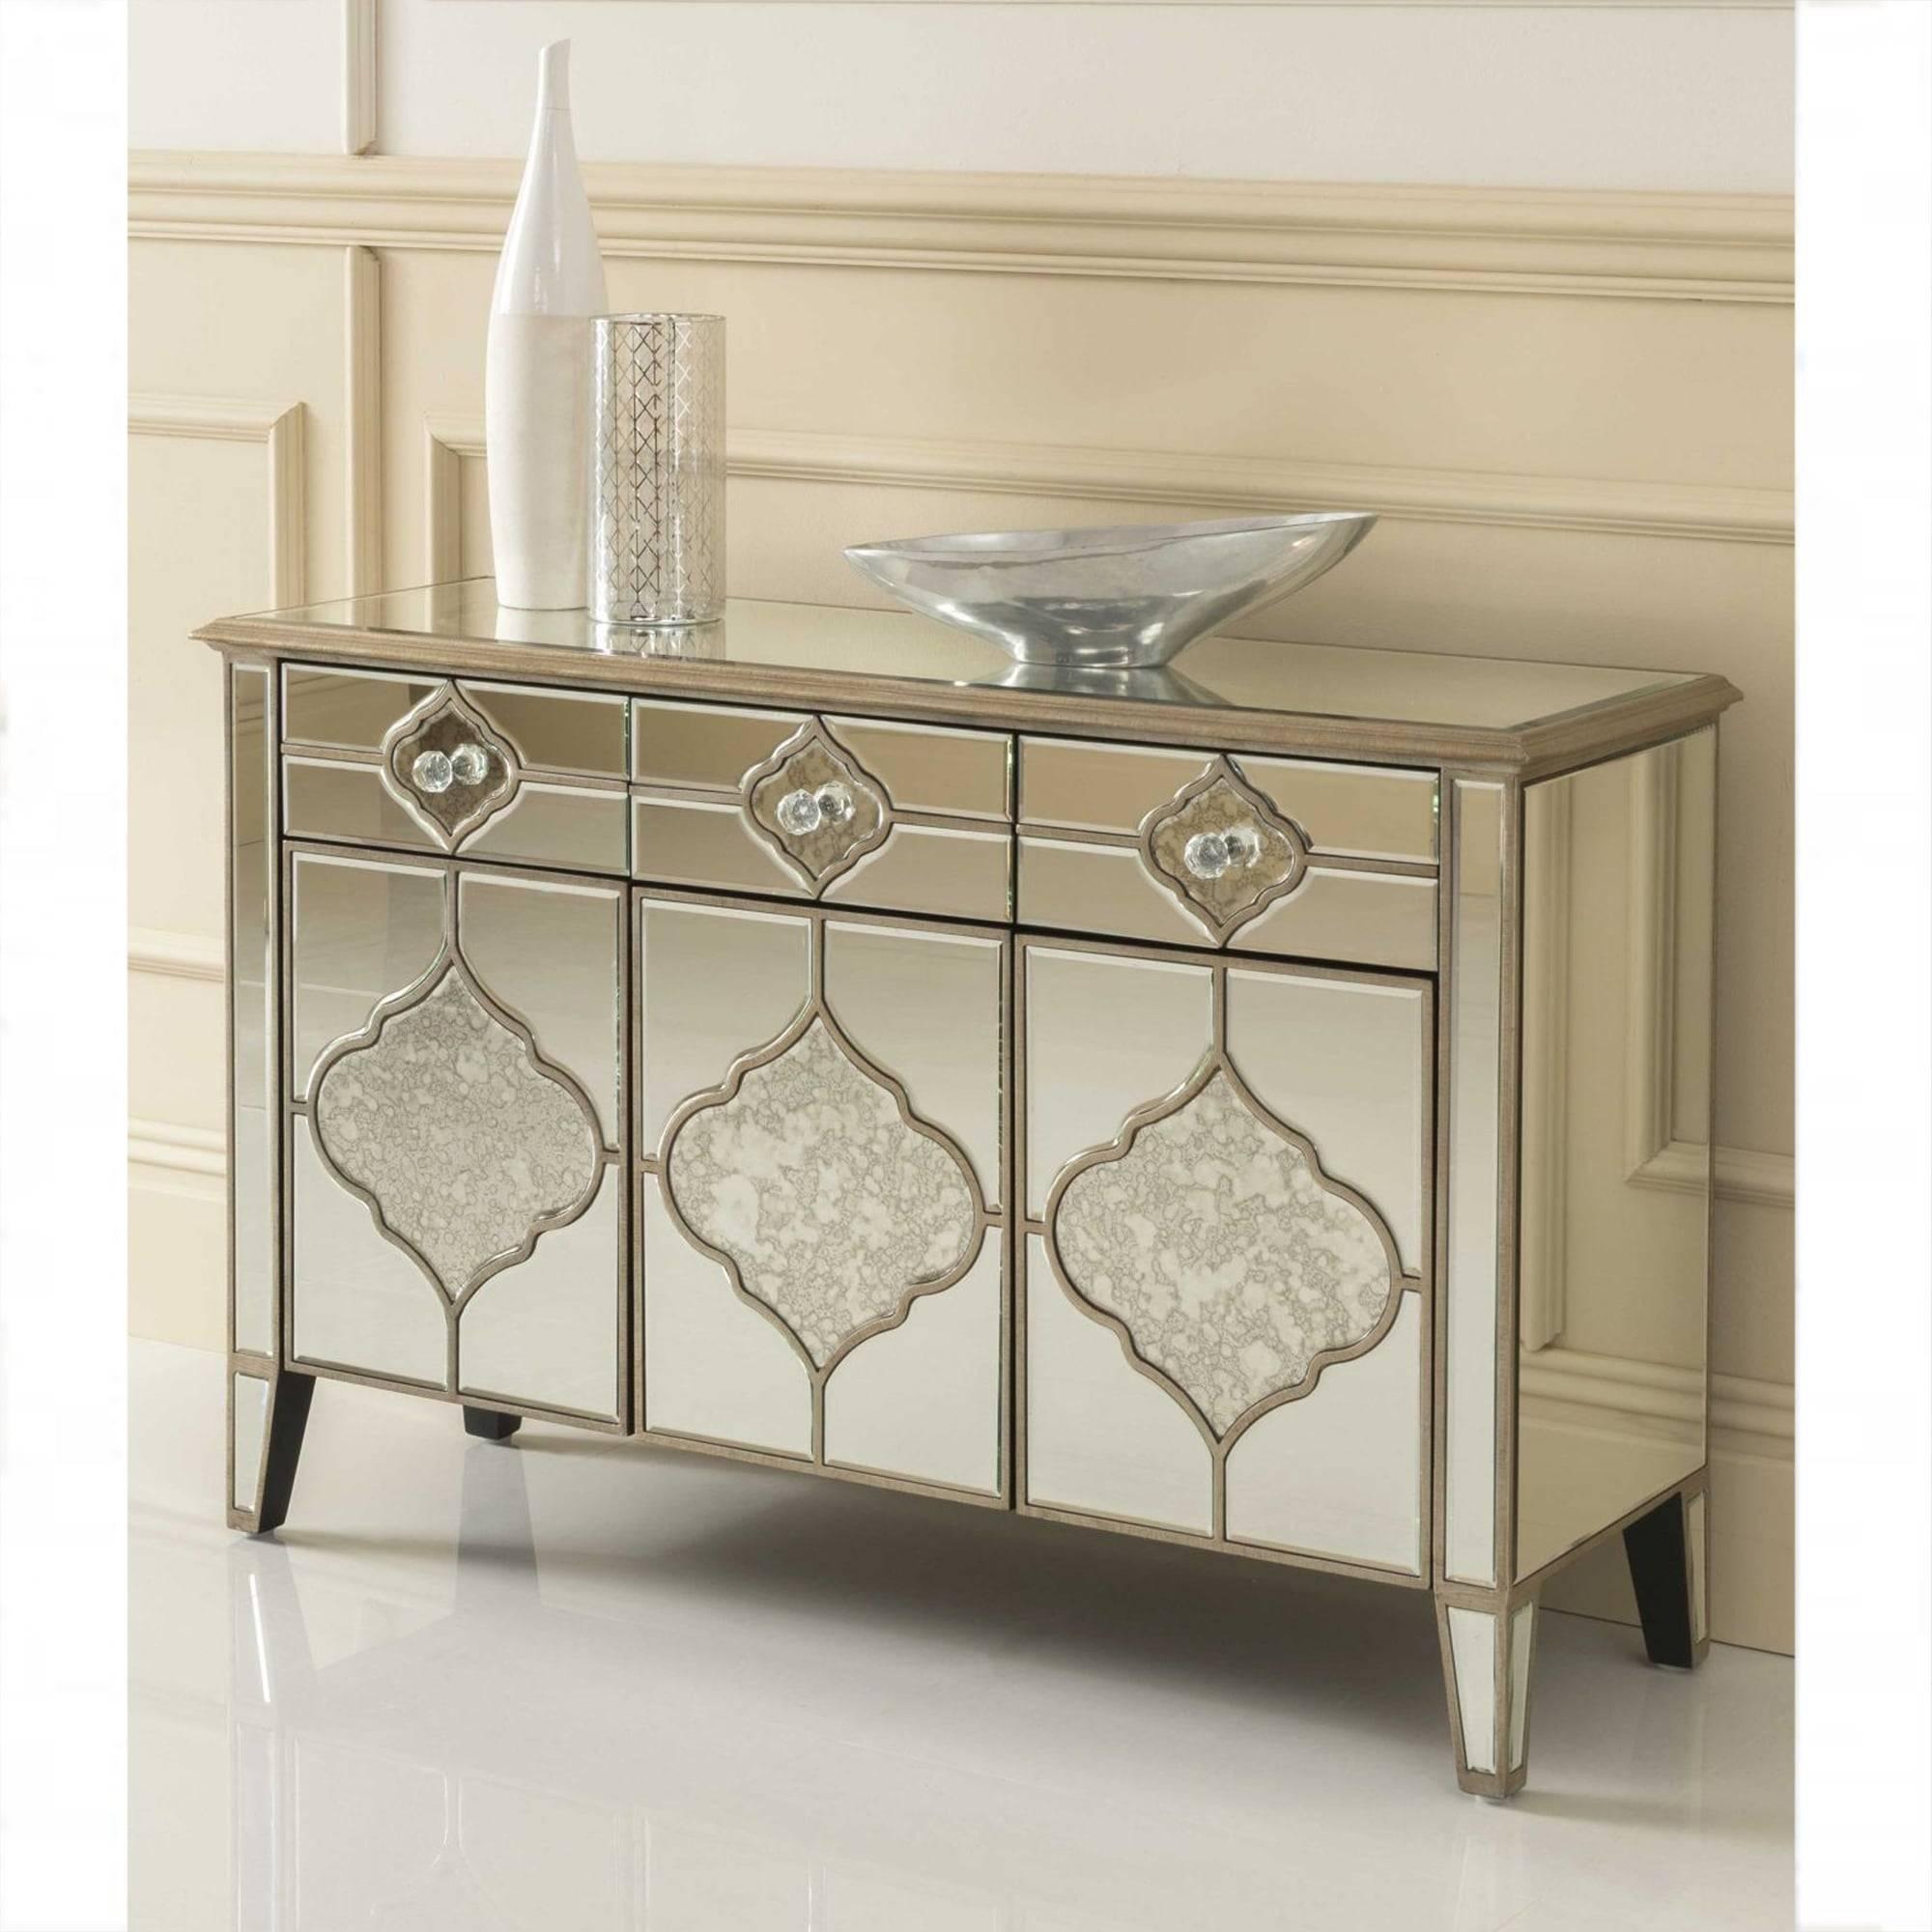 Sassari Mirrored Sideboard | Venetian Glass Furniture Regarding Most Recently Released Mirror Sideboards (View 2 of 15)